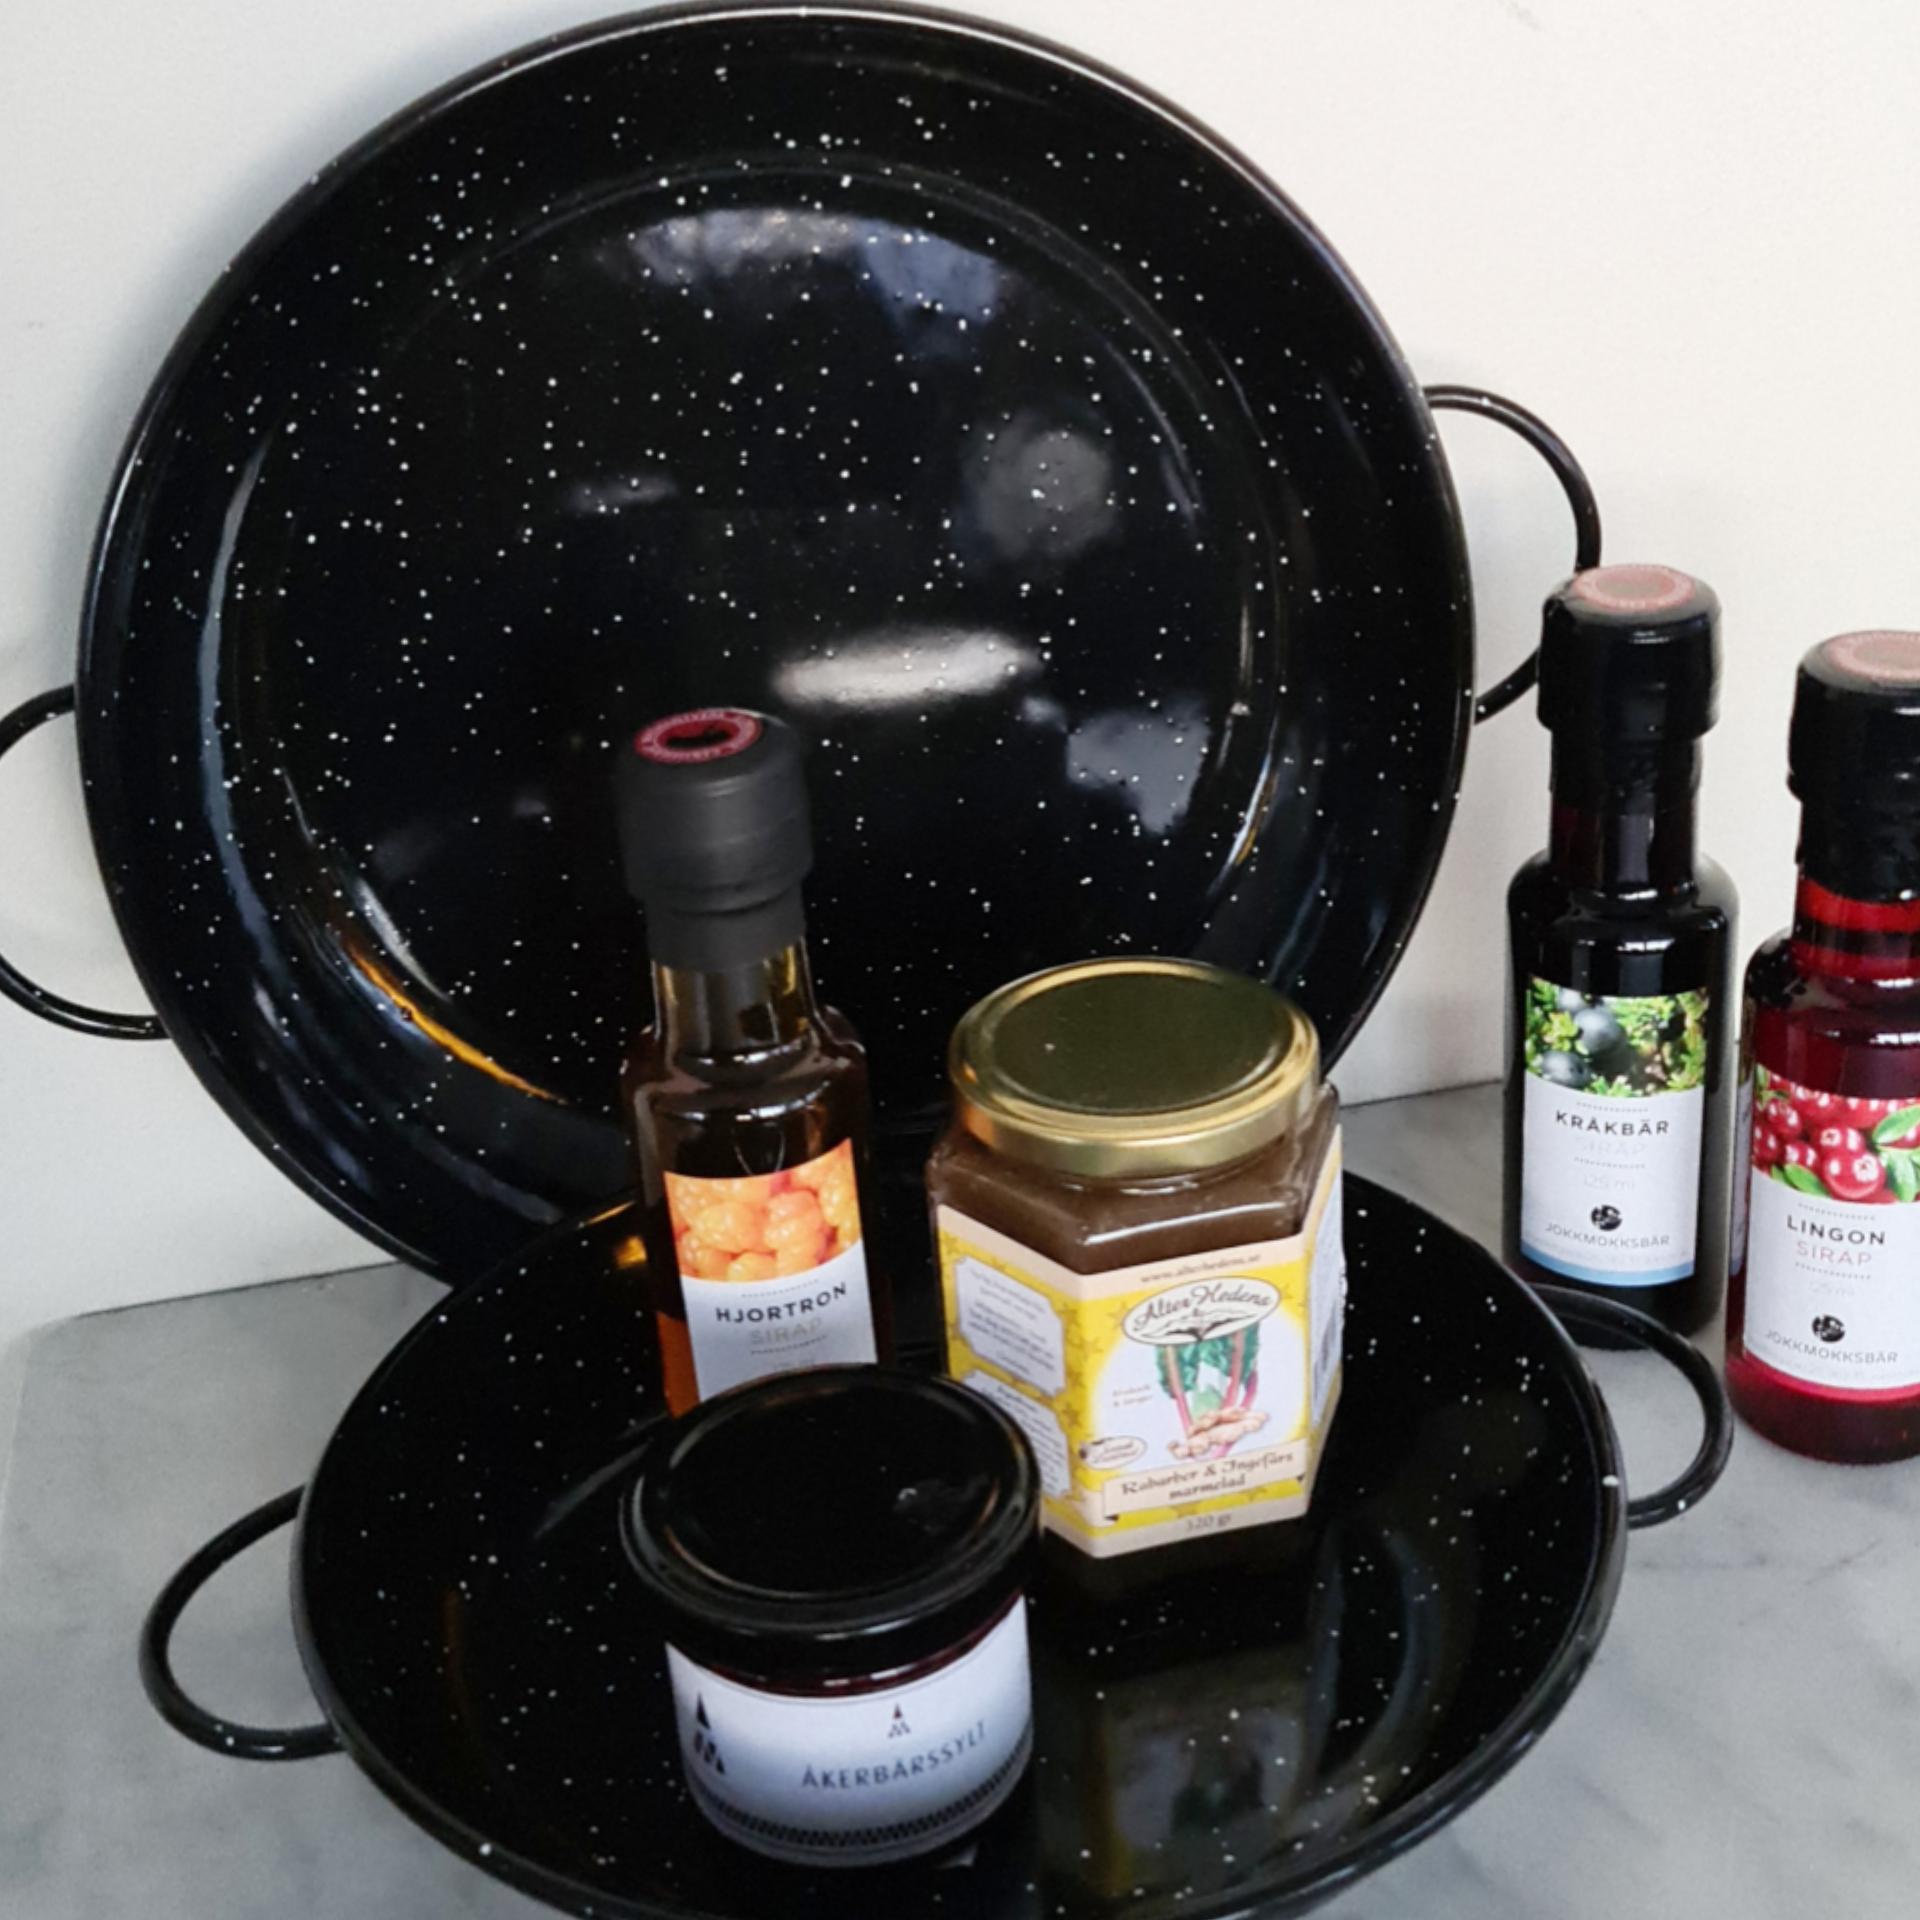 emaljerad-panna-svart-ute-matlagning-matlagning-paj-ugn-grillen-hjortron-sirap-akerbarssylt-